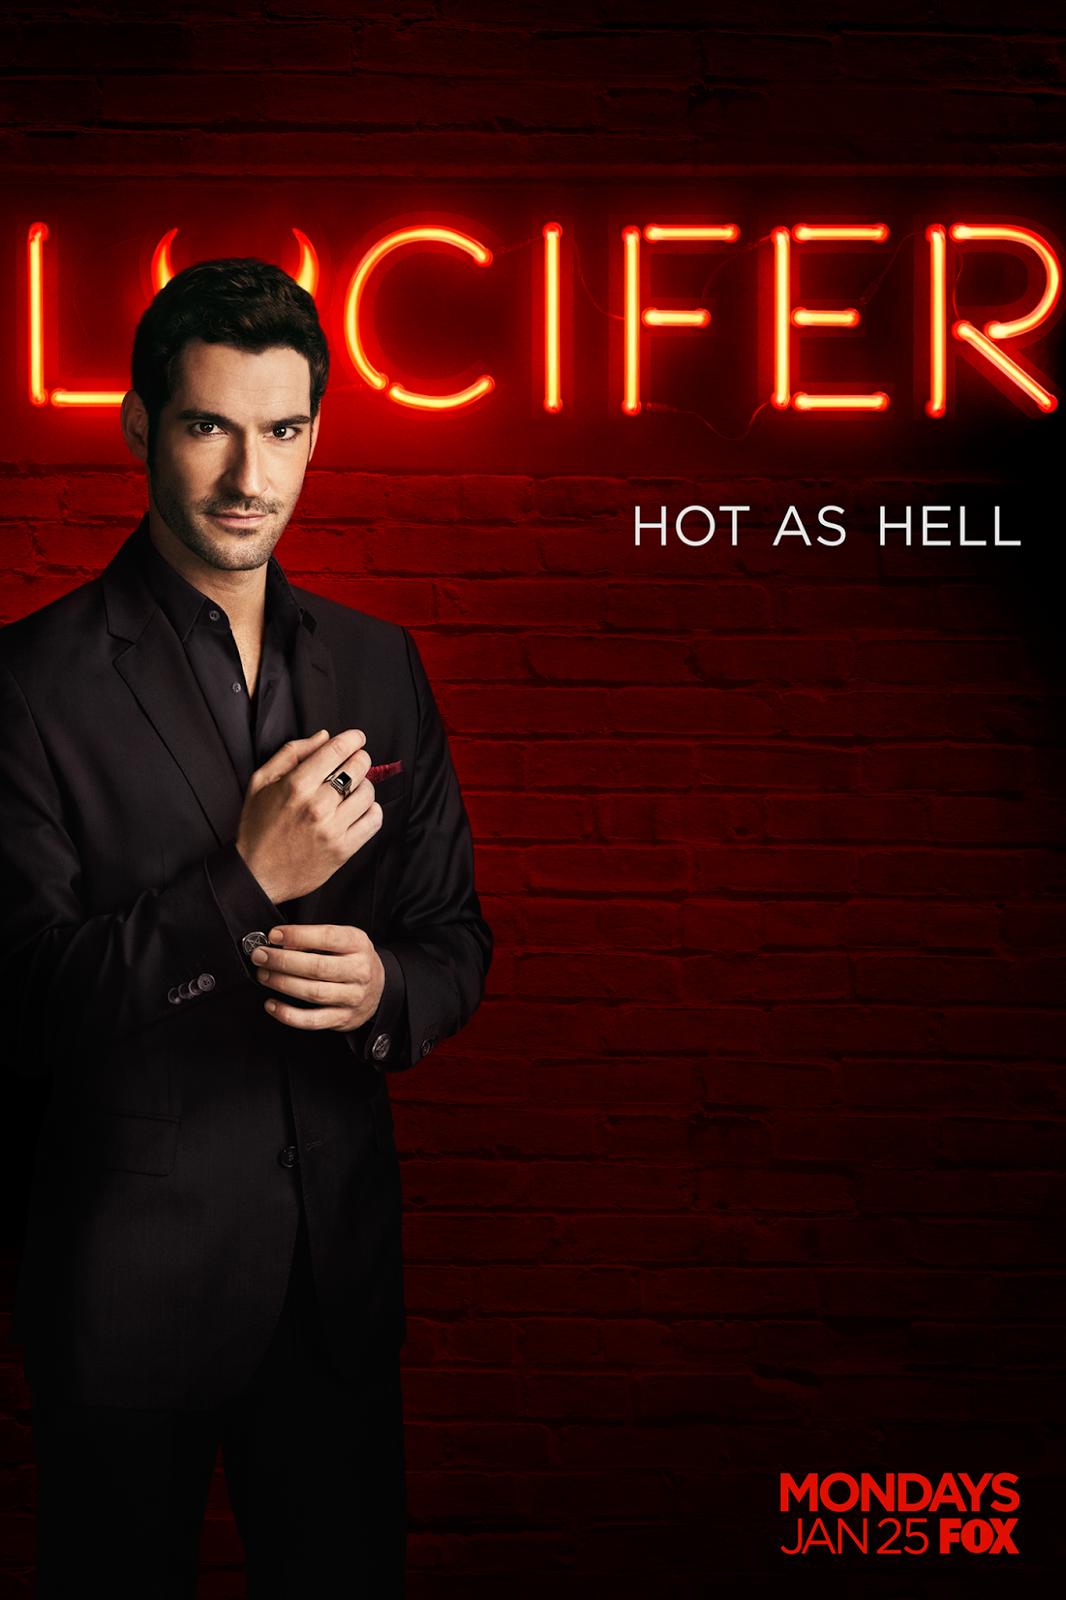 Nonton Lucifer season 2 2017 sub indo